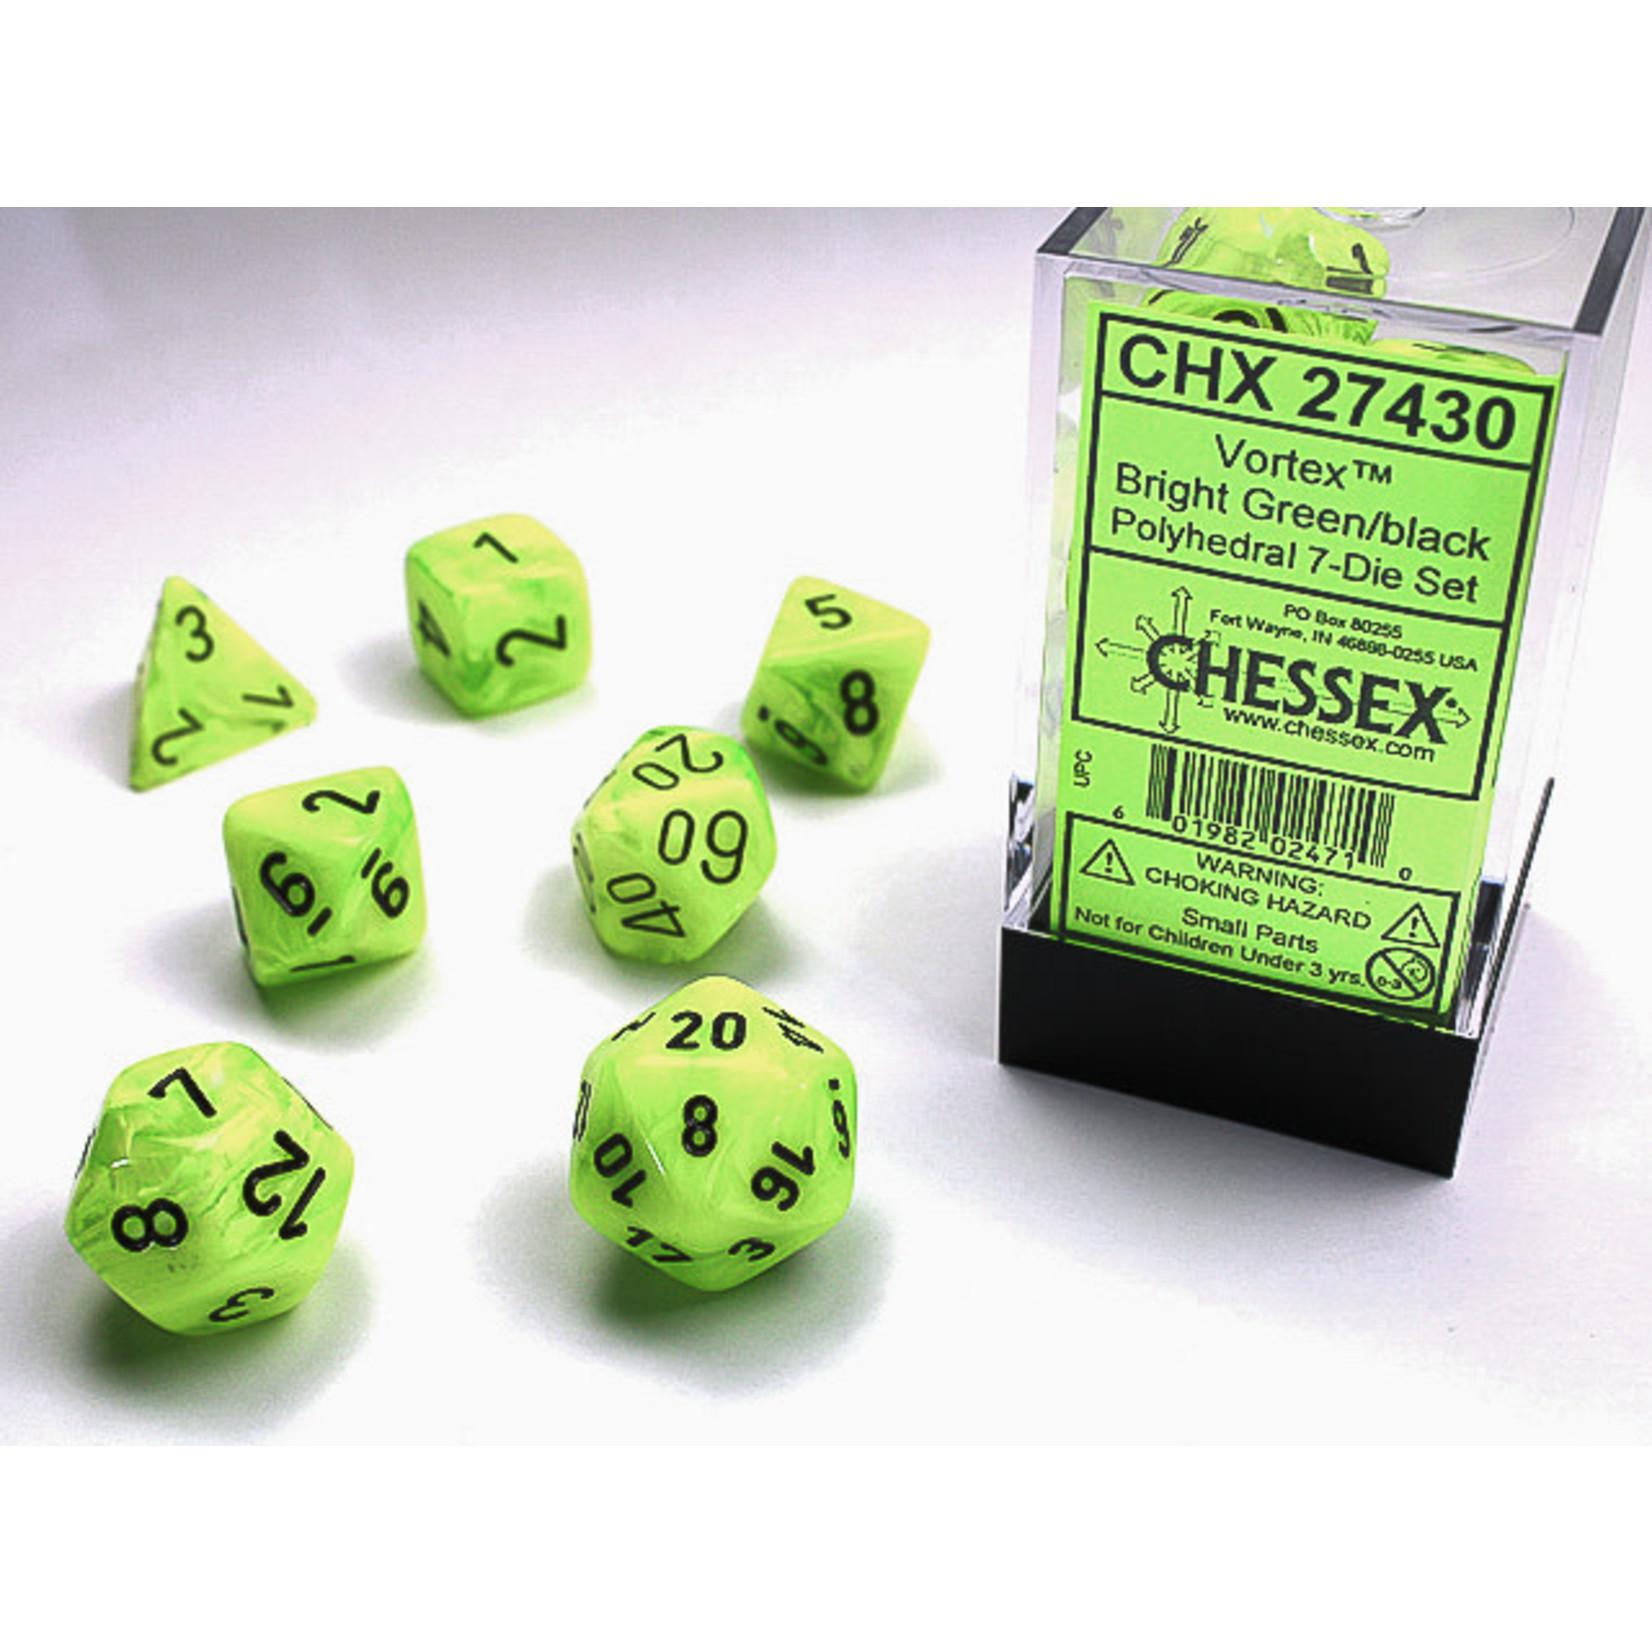 Chessex 27430 Vortex 7pc Bright Green/Black RPG Dice